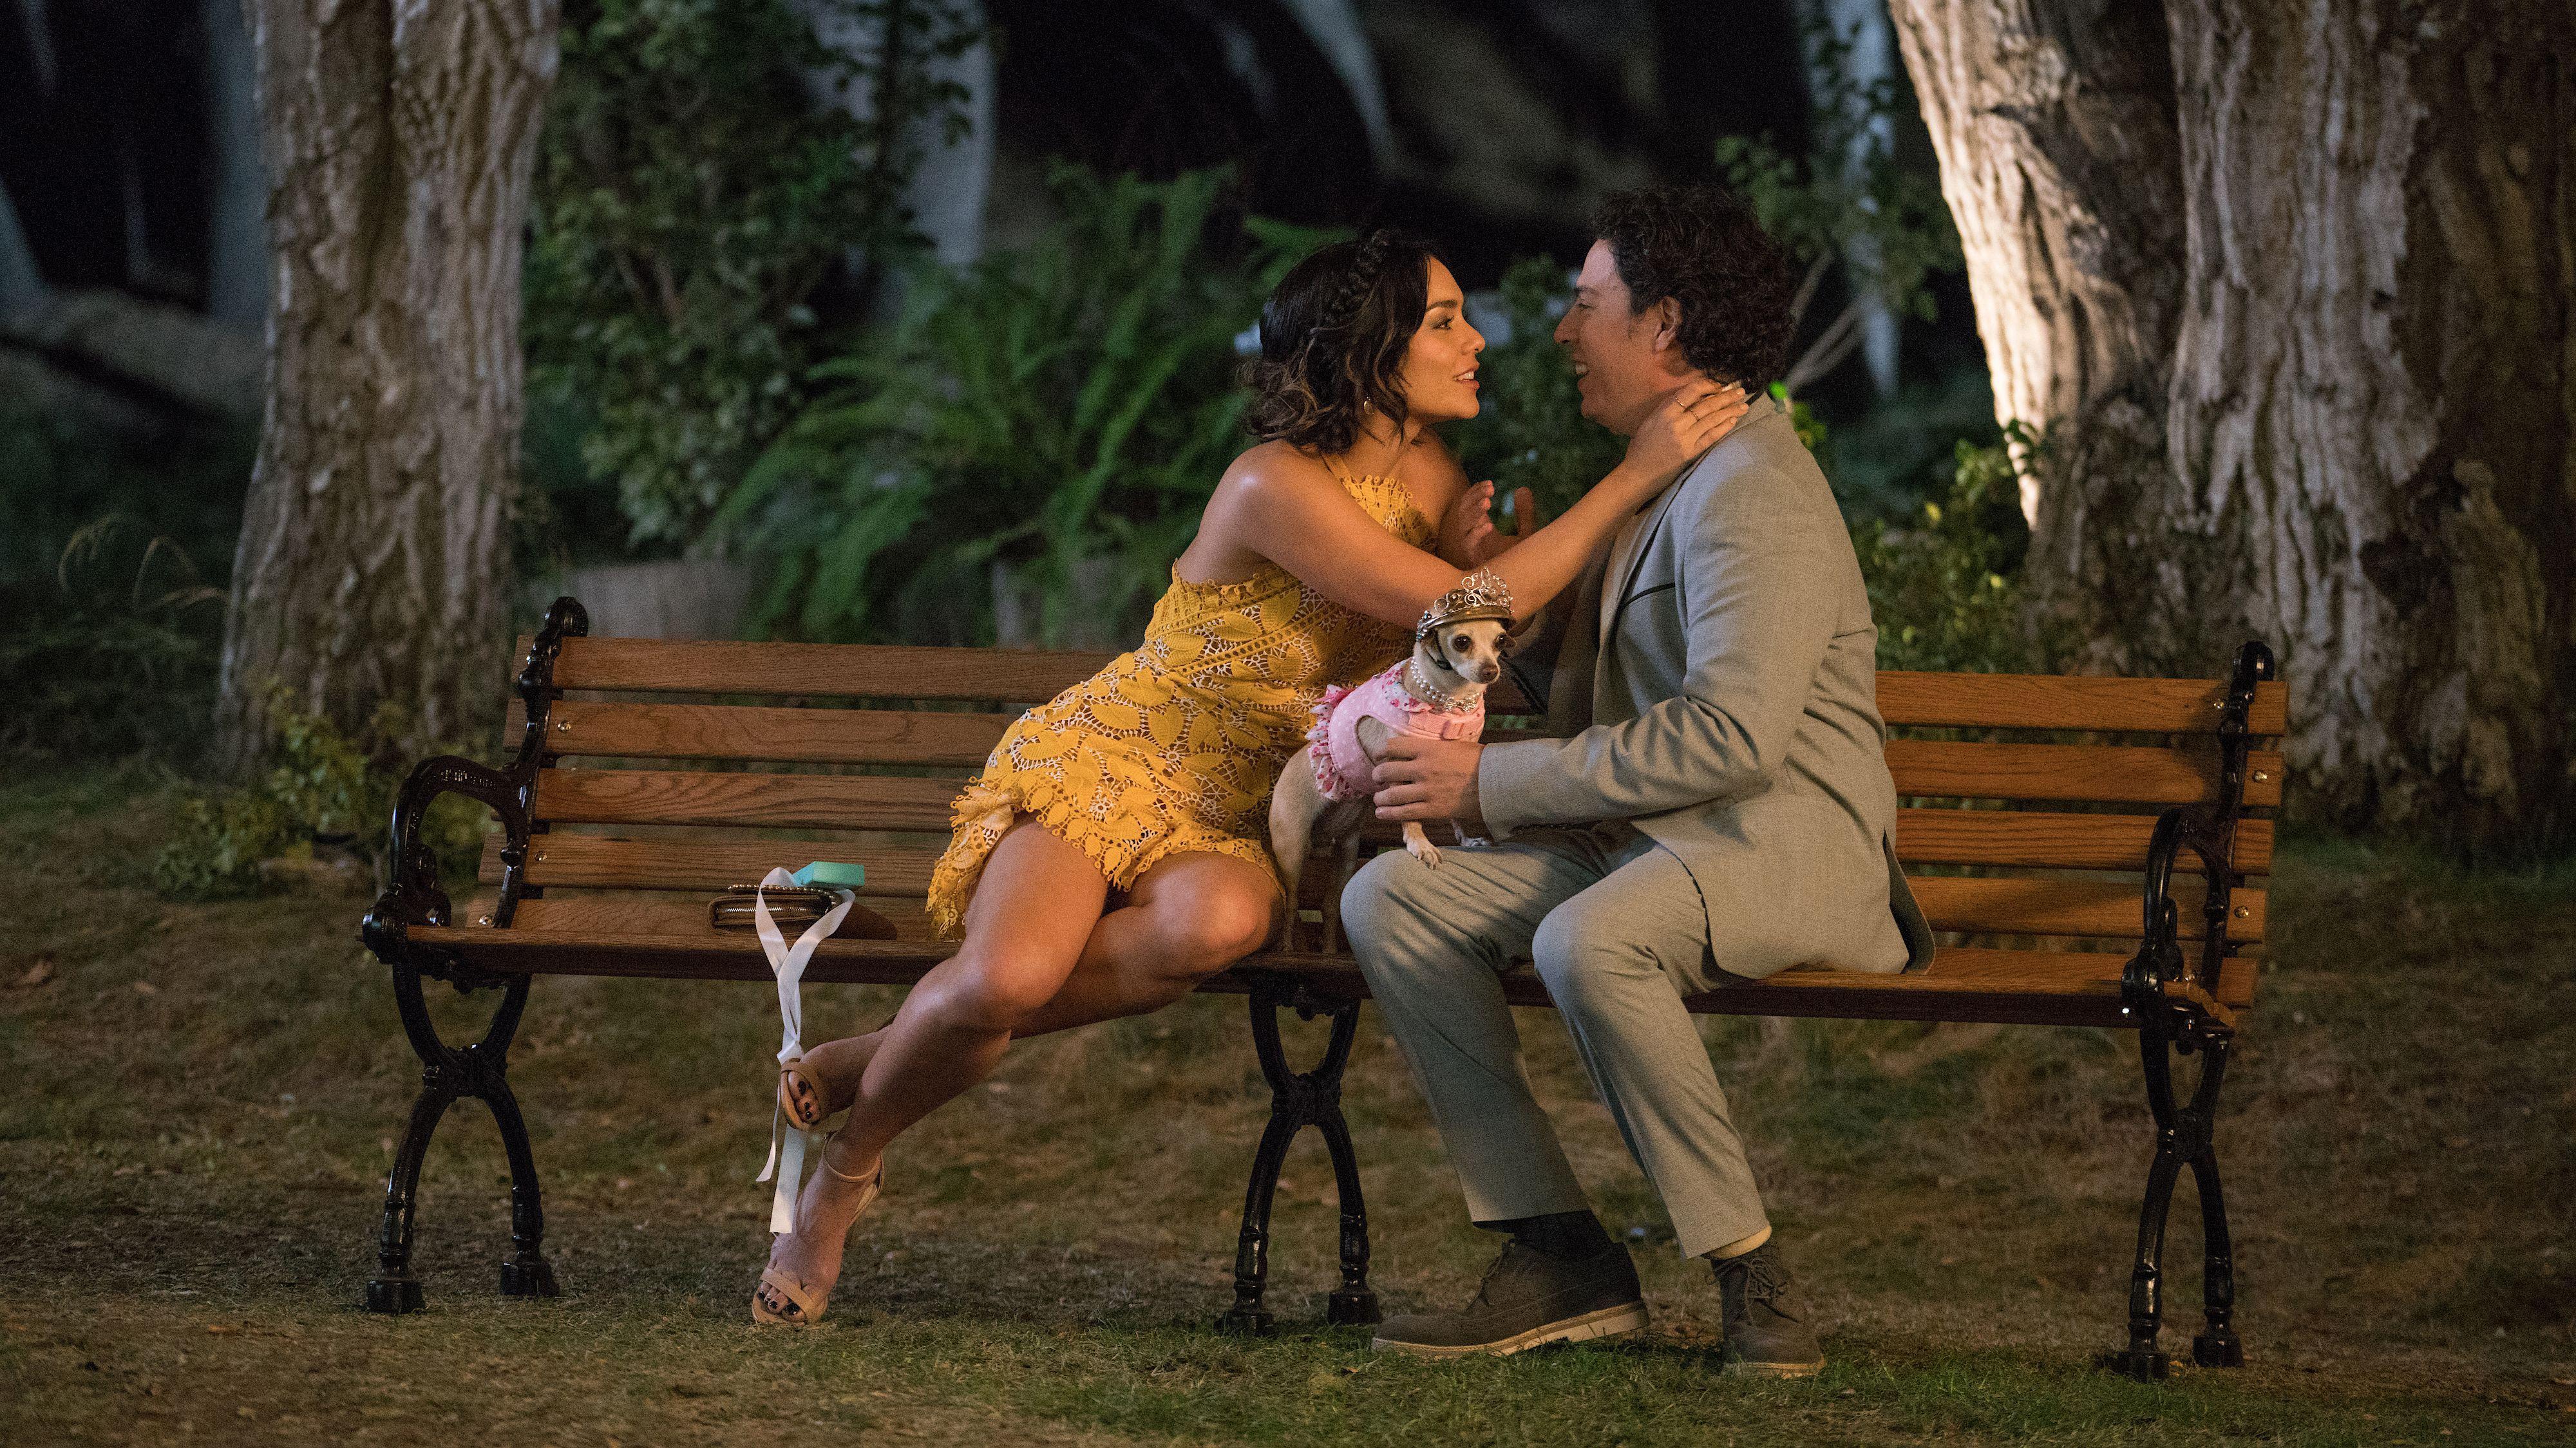 filmcolumbia 2018 nine days 50 films